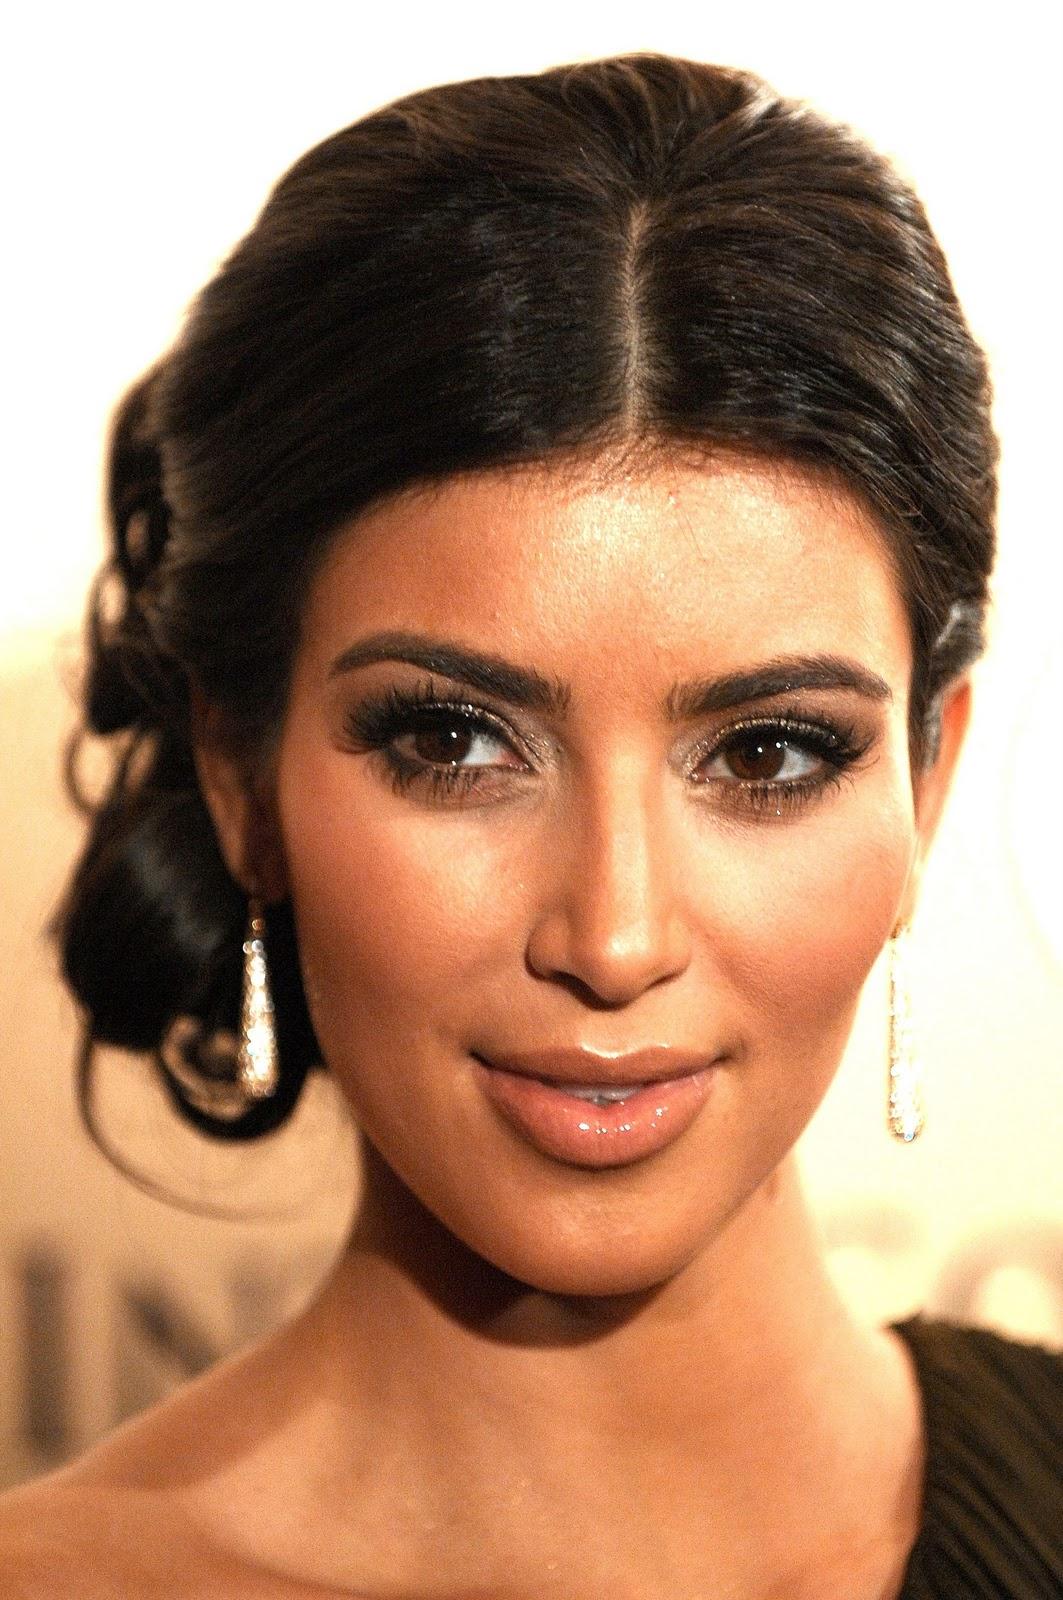 http://4.bp.blogspot.com/-ZEok29xaZZM/TrewjRc1_2I/AAAAAAAAAHs/q2Ce3brALXc/s1600/pinipone.blogspot.com-Kim-Kardashian-Eye-Makeup.jpg